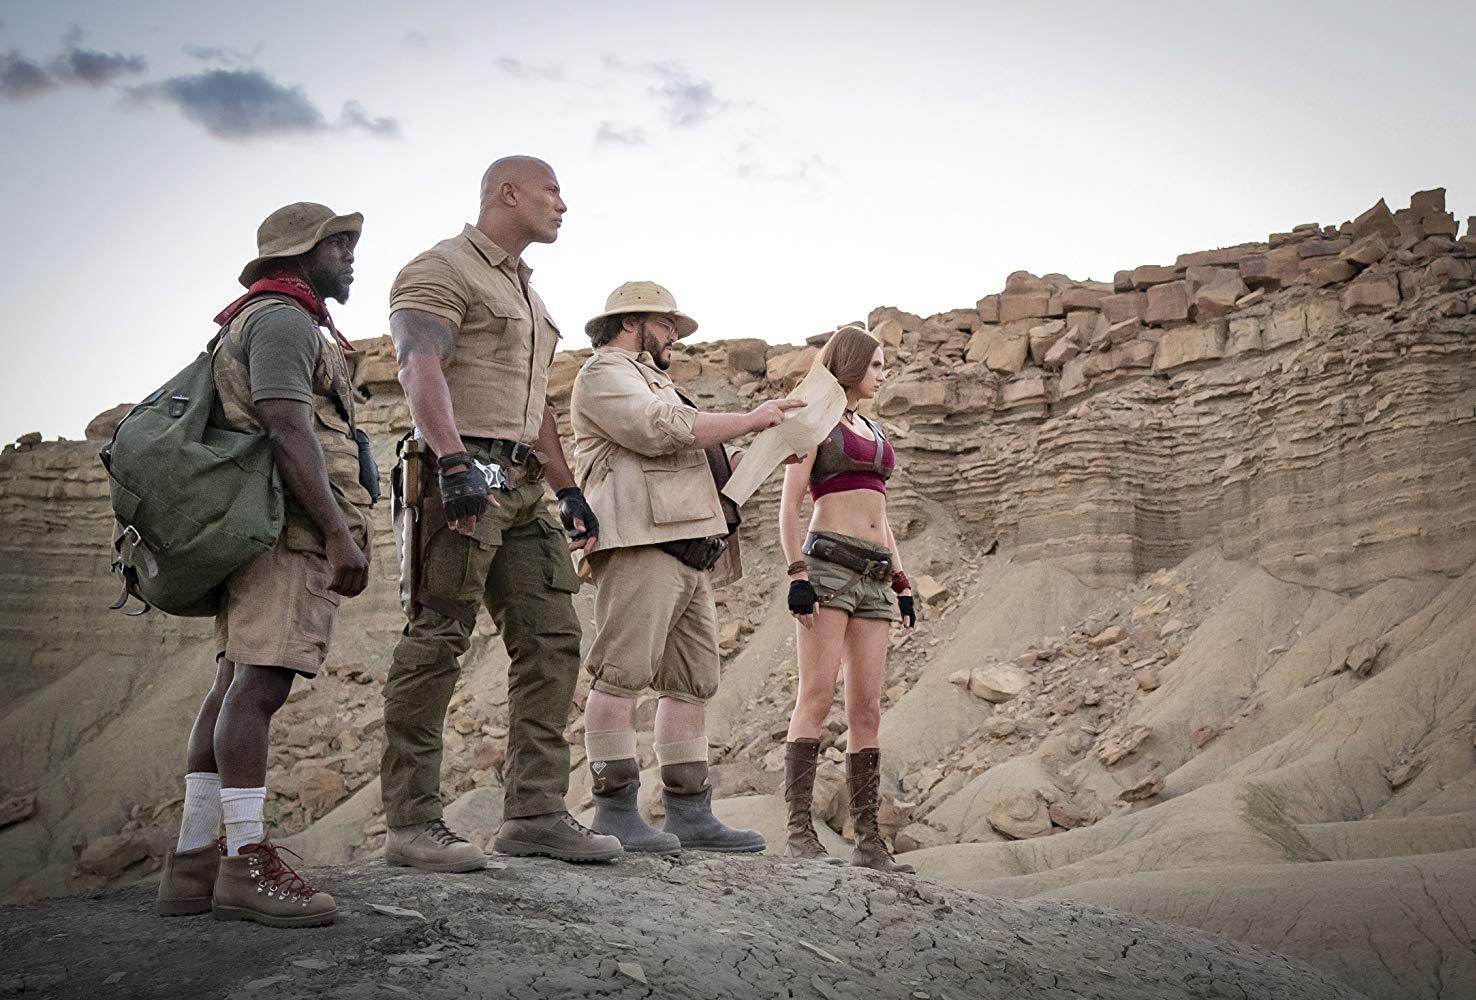 Kevin Hart, Dwayne Johnson, Jack Black and Karen Gillan in 'Jumanji: The Next Level' (2019)